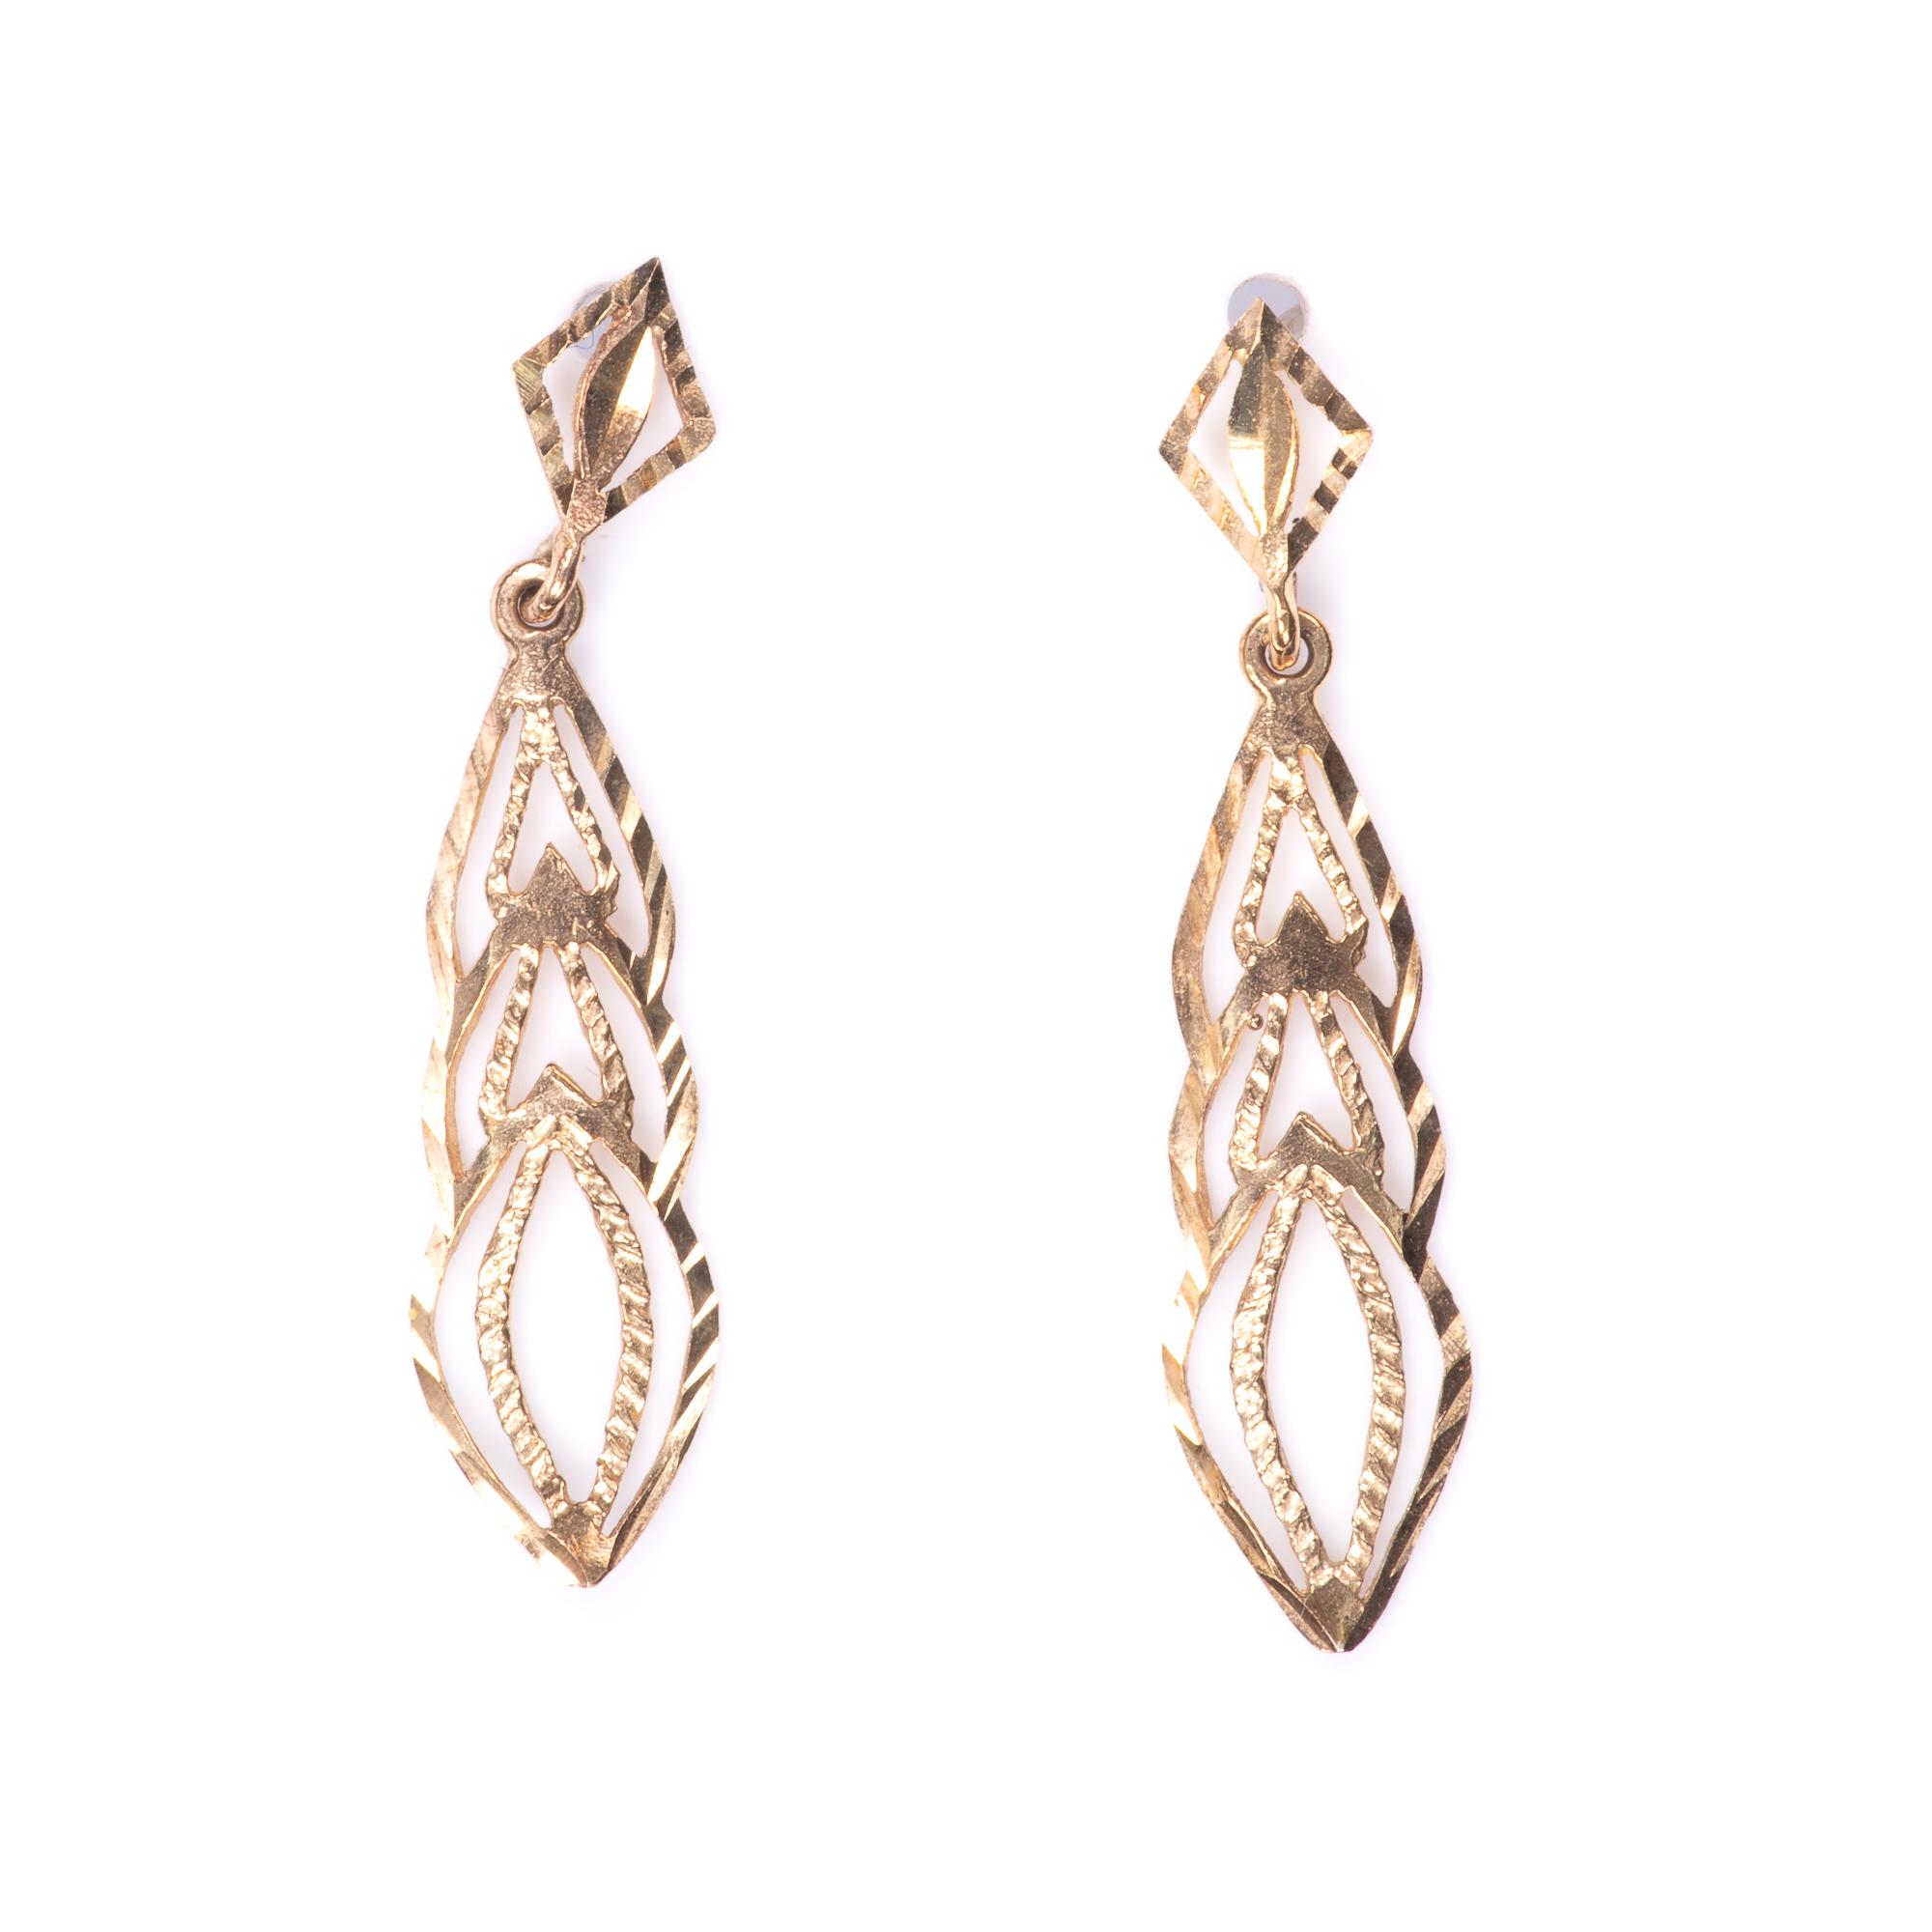 9ct Gold Filigree Earrings - Image 3 of 7